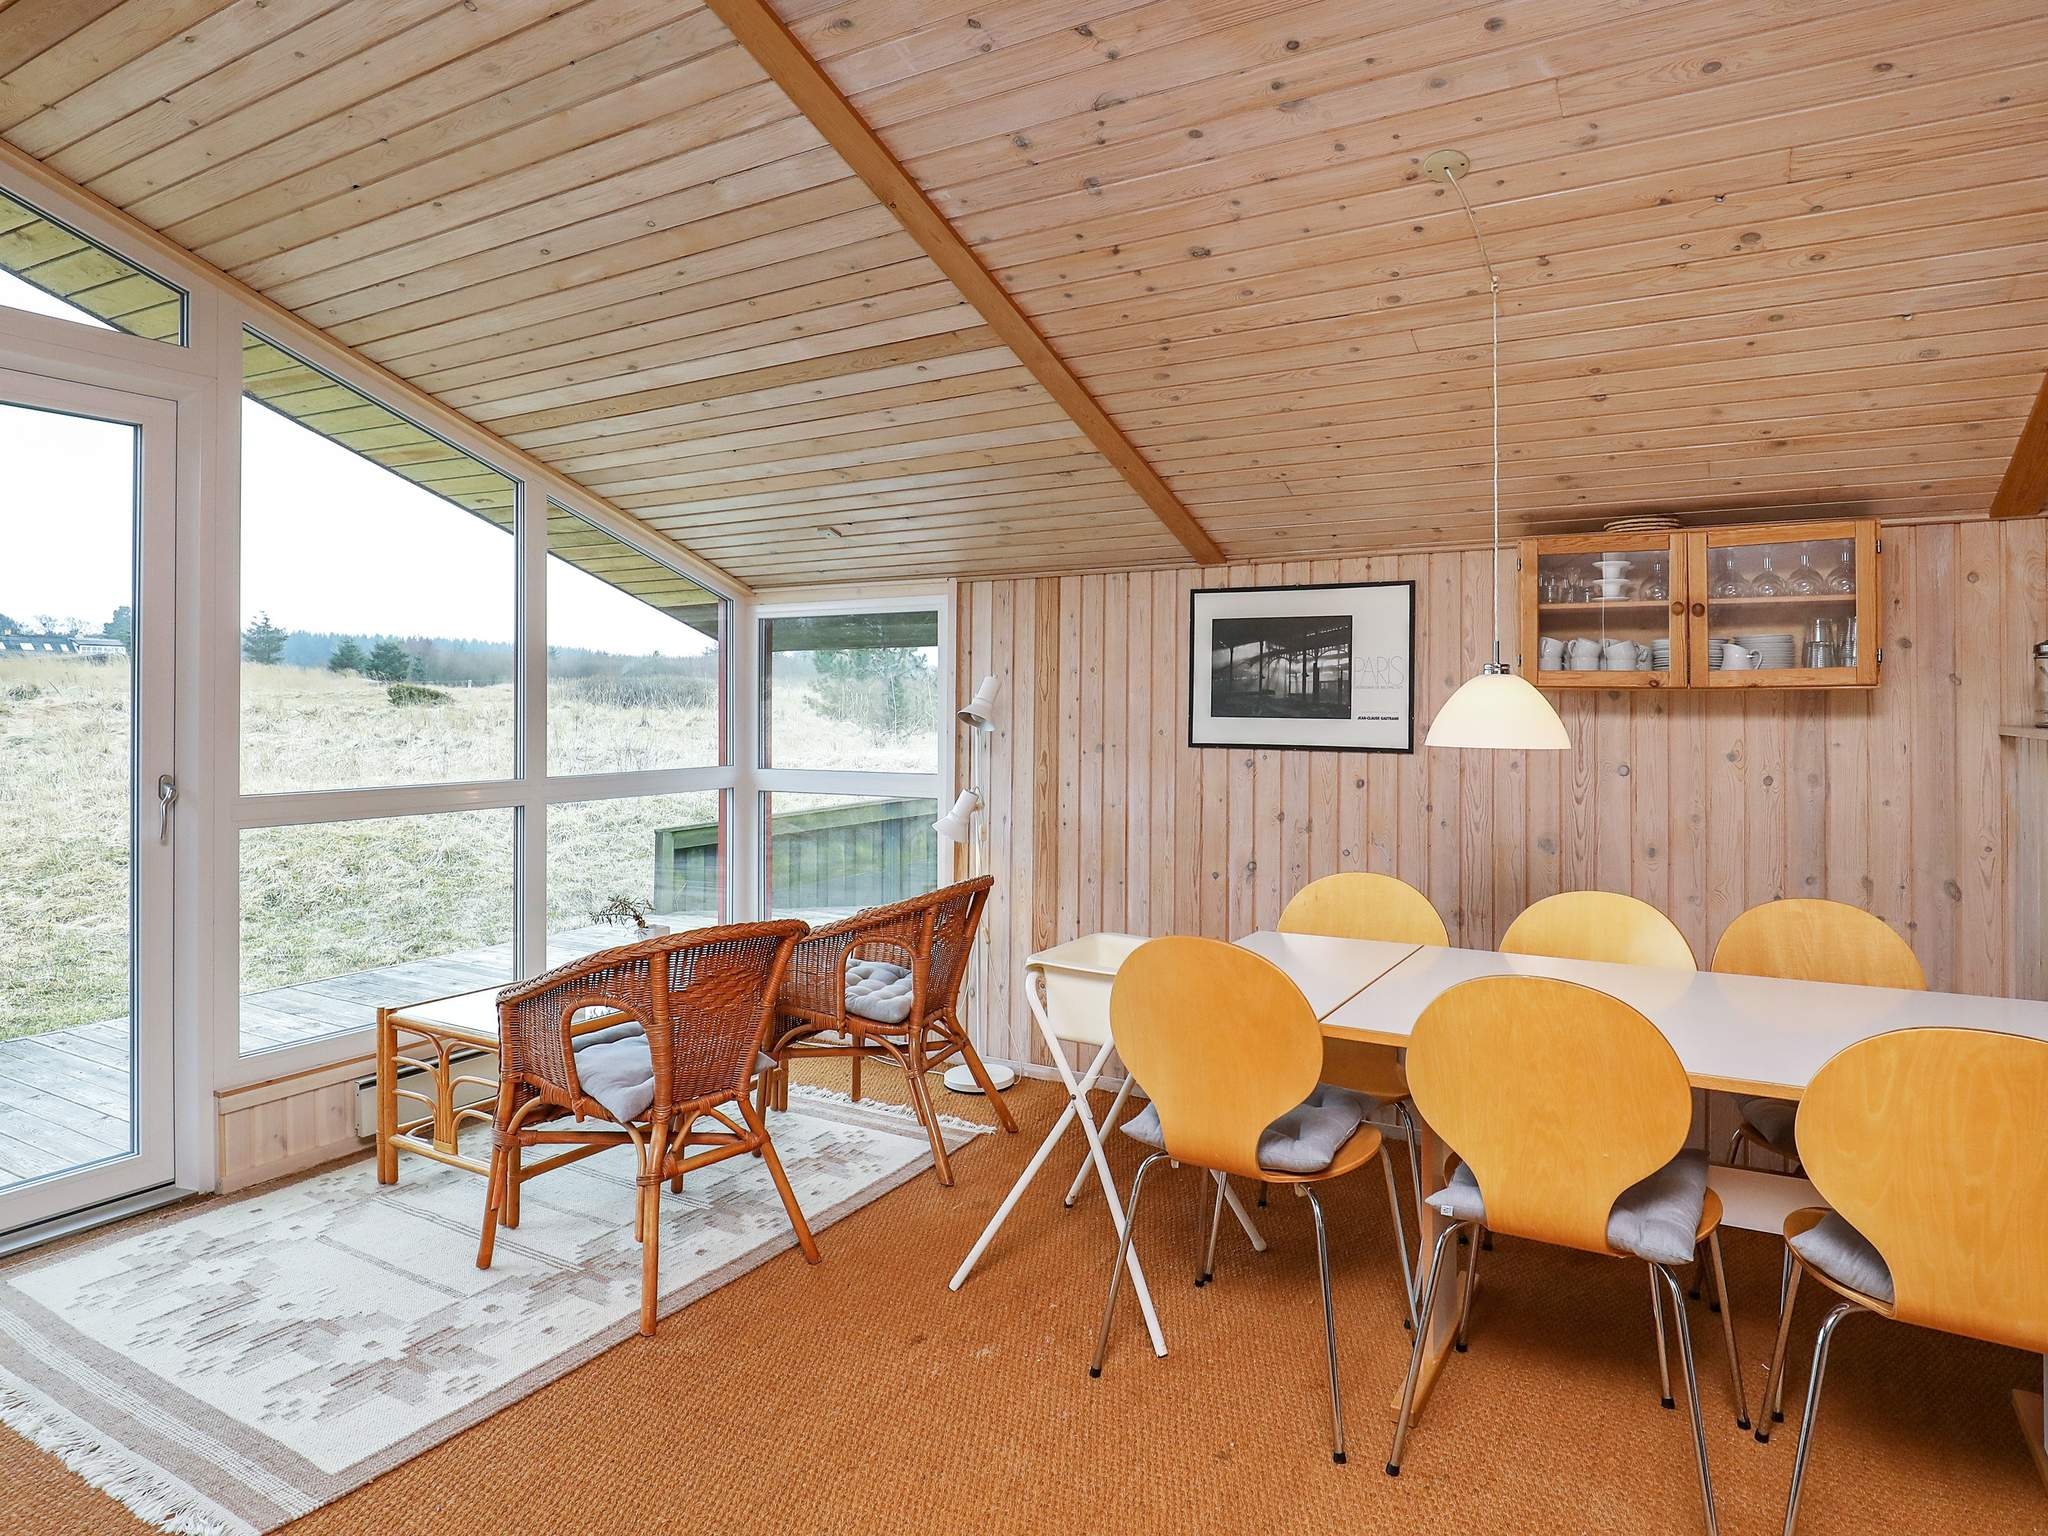 Ferienhaus Kjul Strand (319409), Hirtshals, , Dänische Nordsee, Dänemark, Bild 5